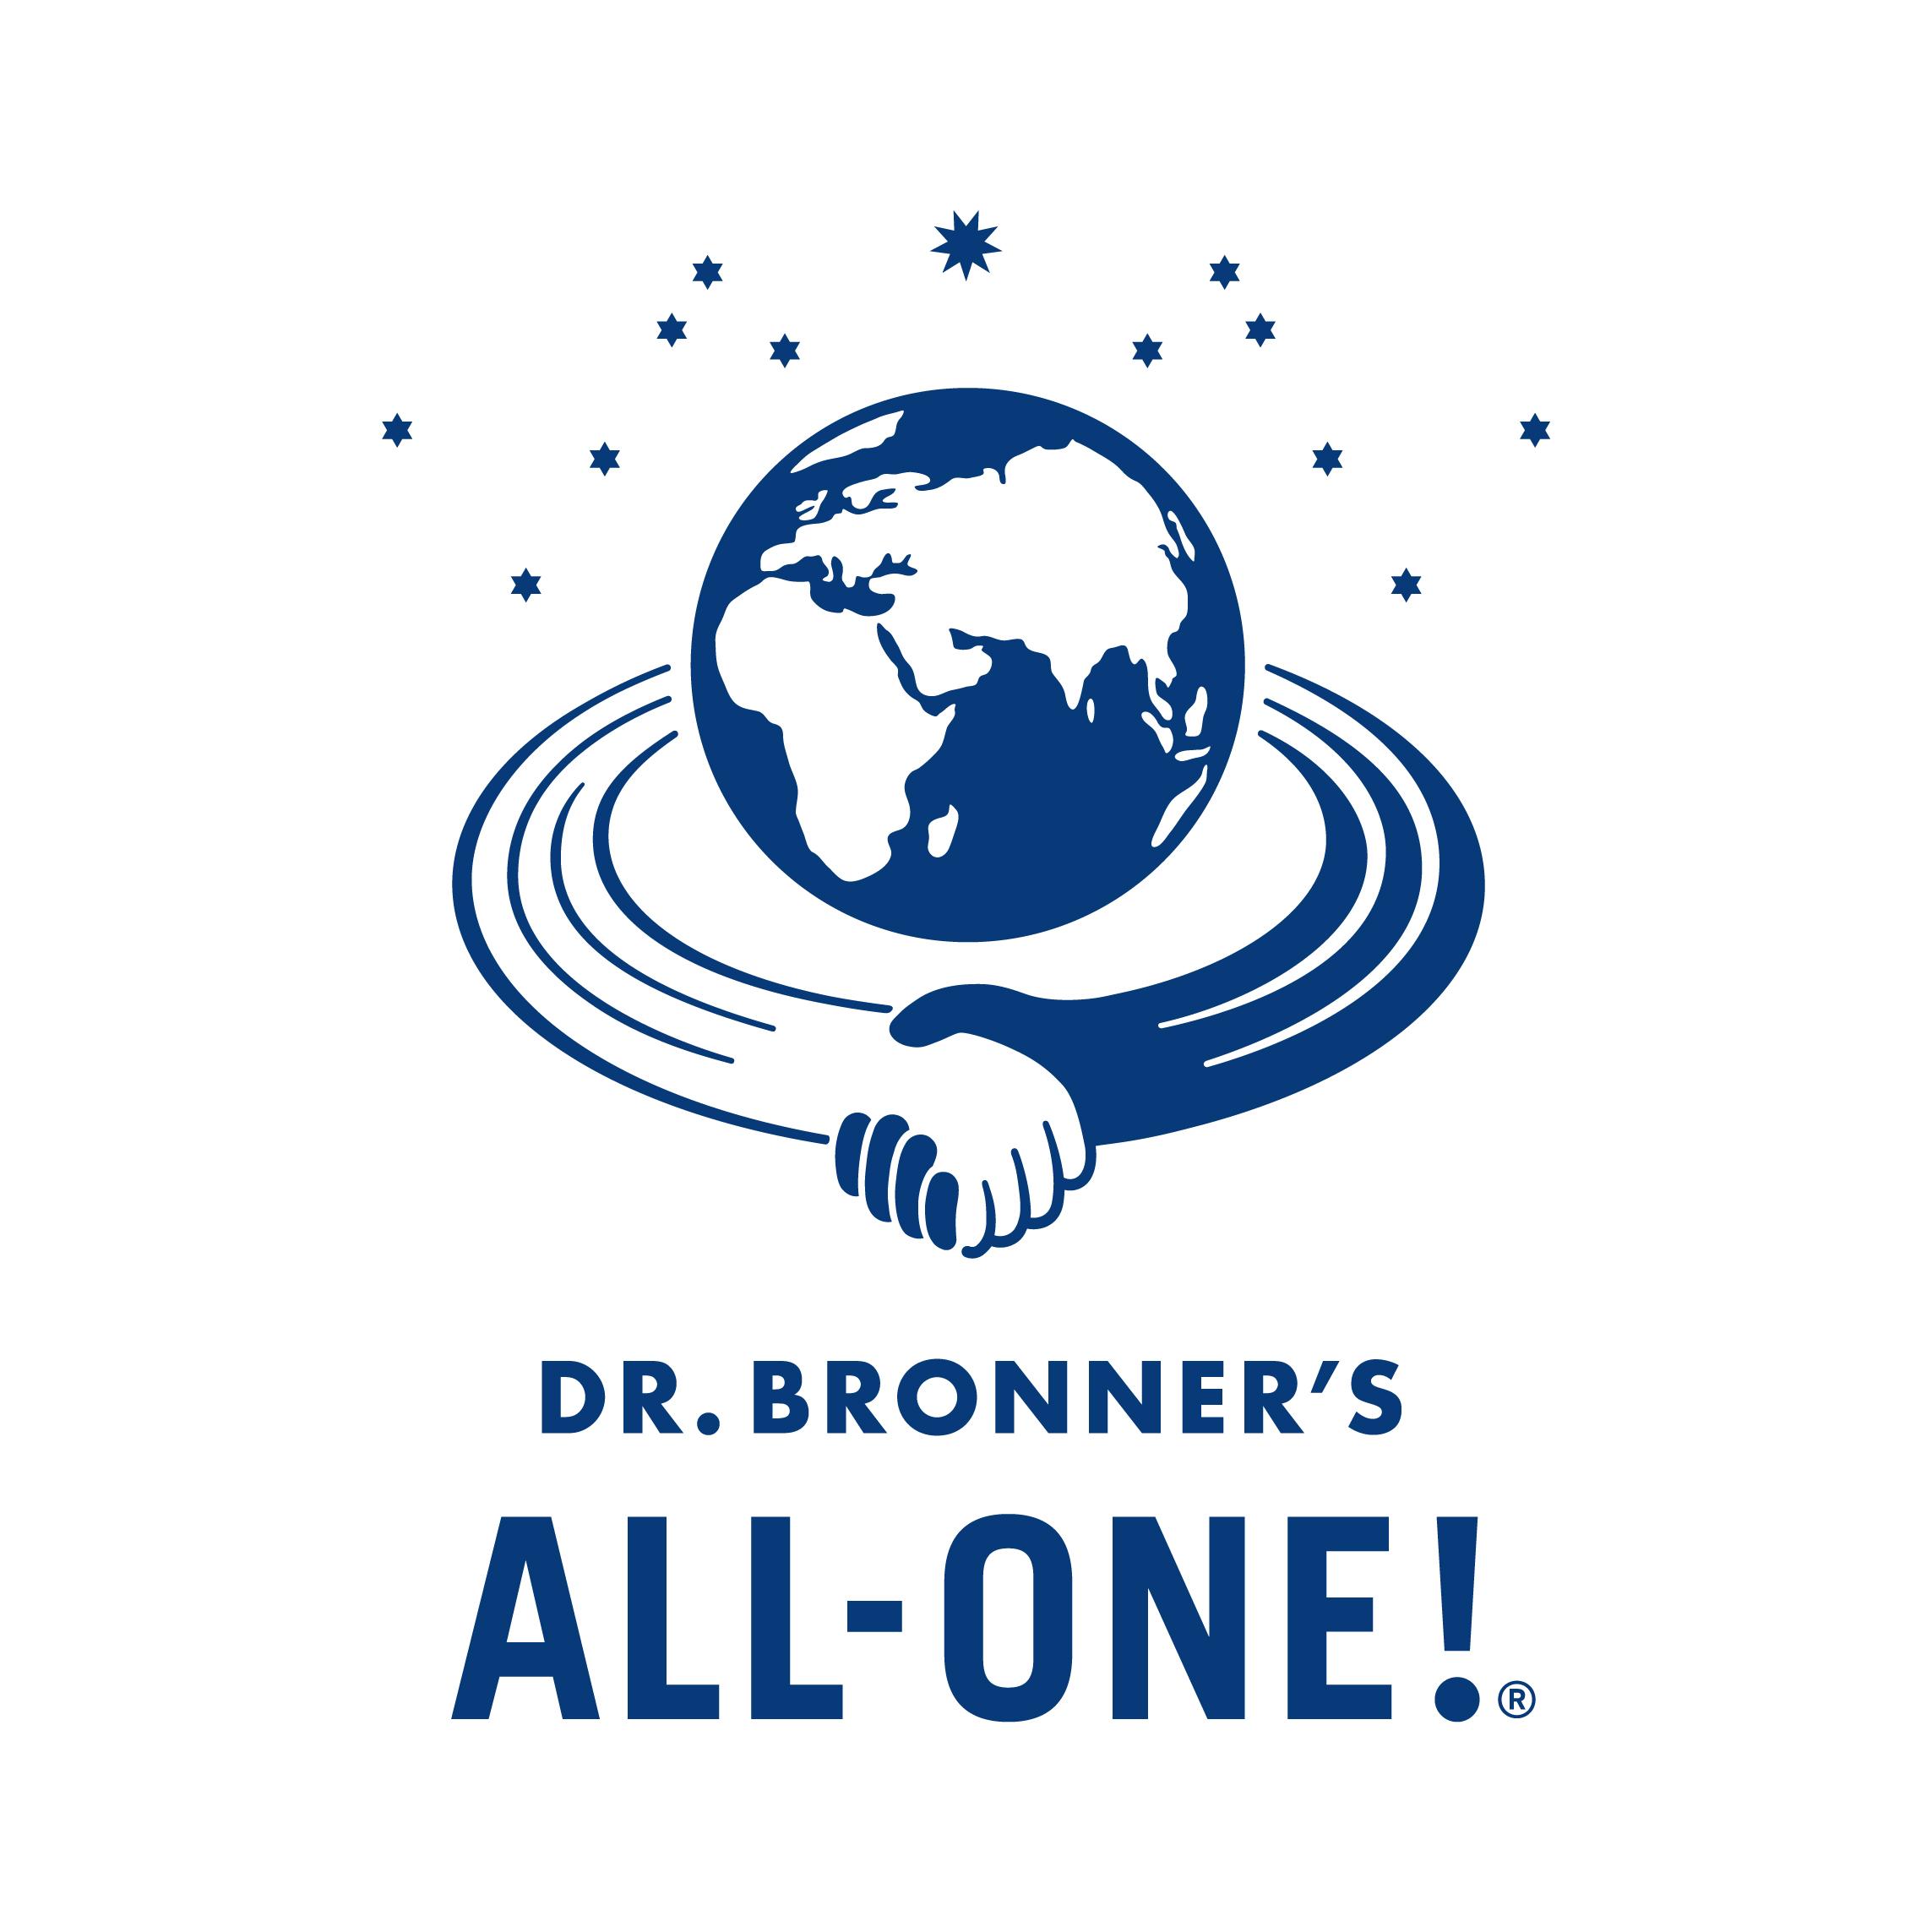 https://www.drbronner.jp/topics/information/info12/